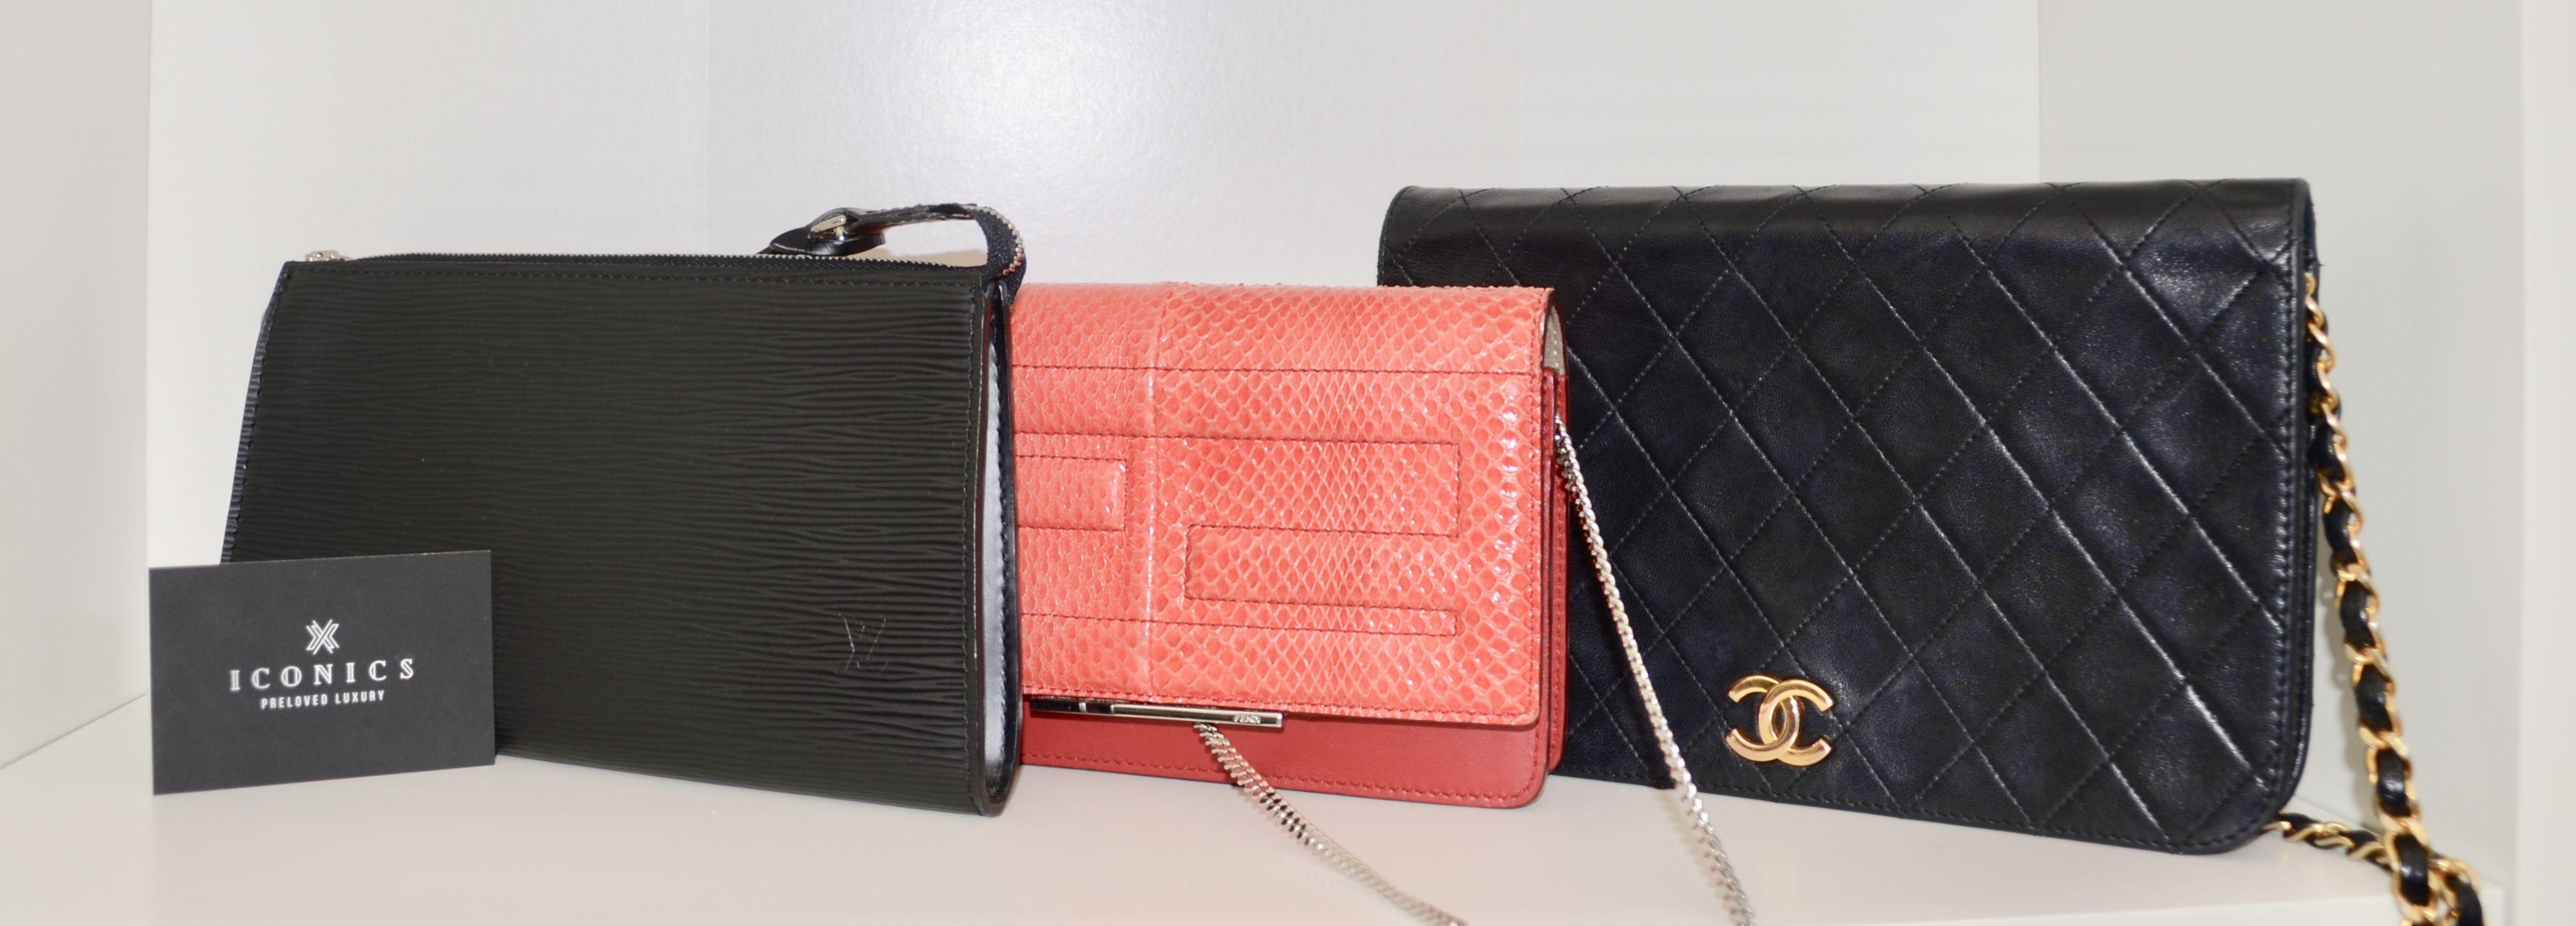 1a9d25456f70 THE SELECTION ! Louis Vuitton Epi bag Fendi tube bag Chanel vintage WOC. Visit  our website and follow us on Instagram.